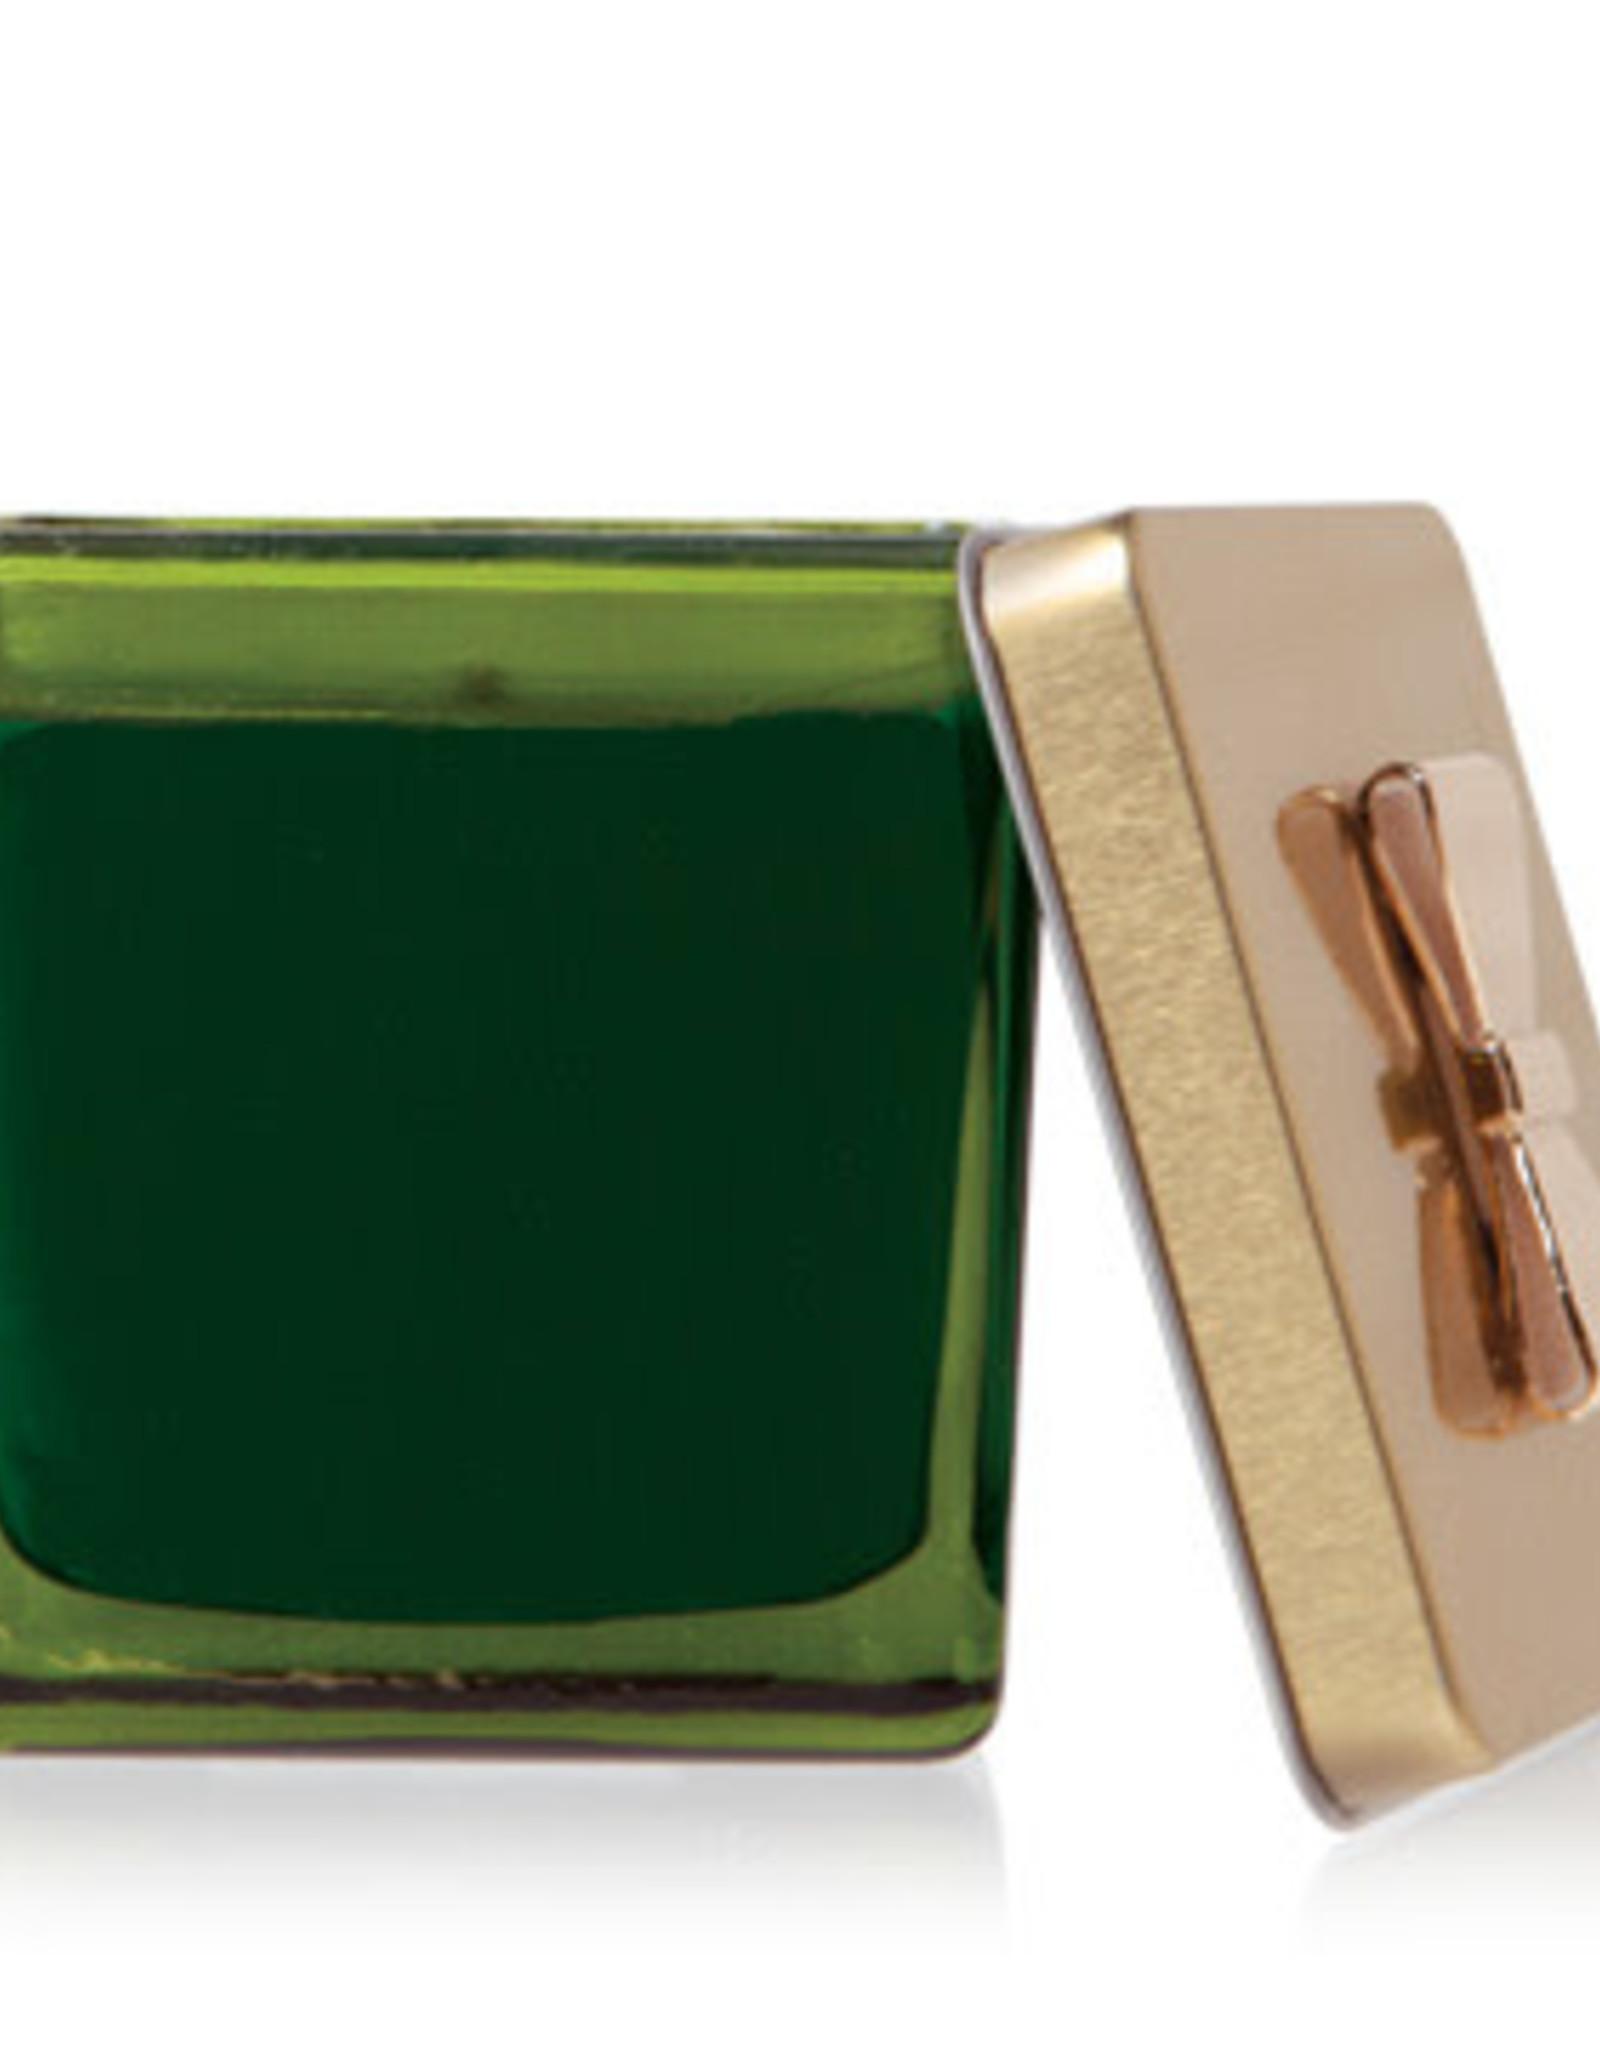 Frasier Fir Small Present Candle